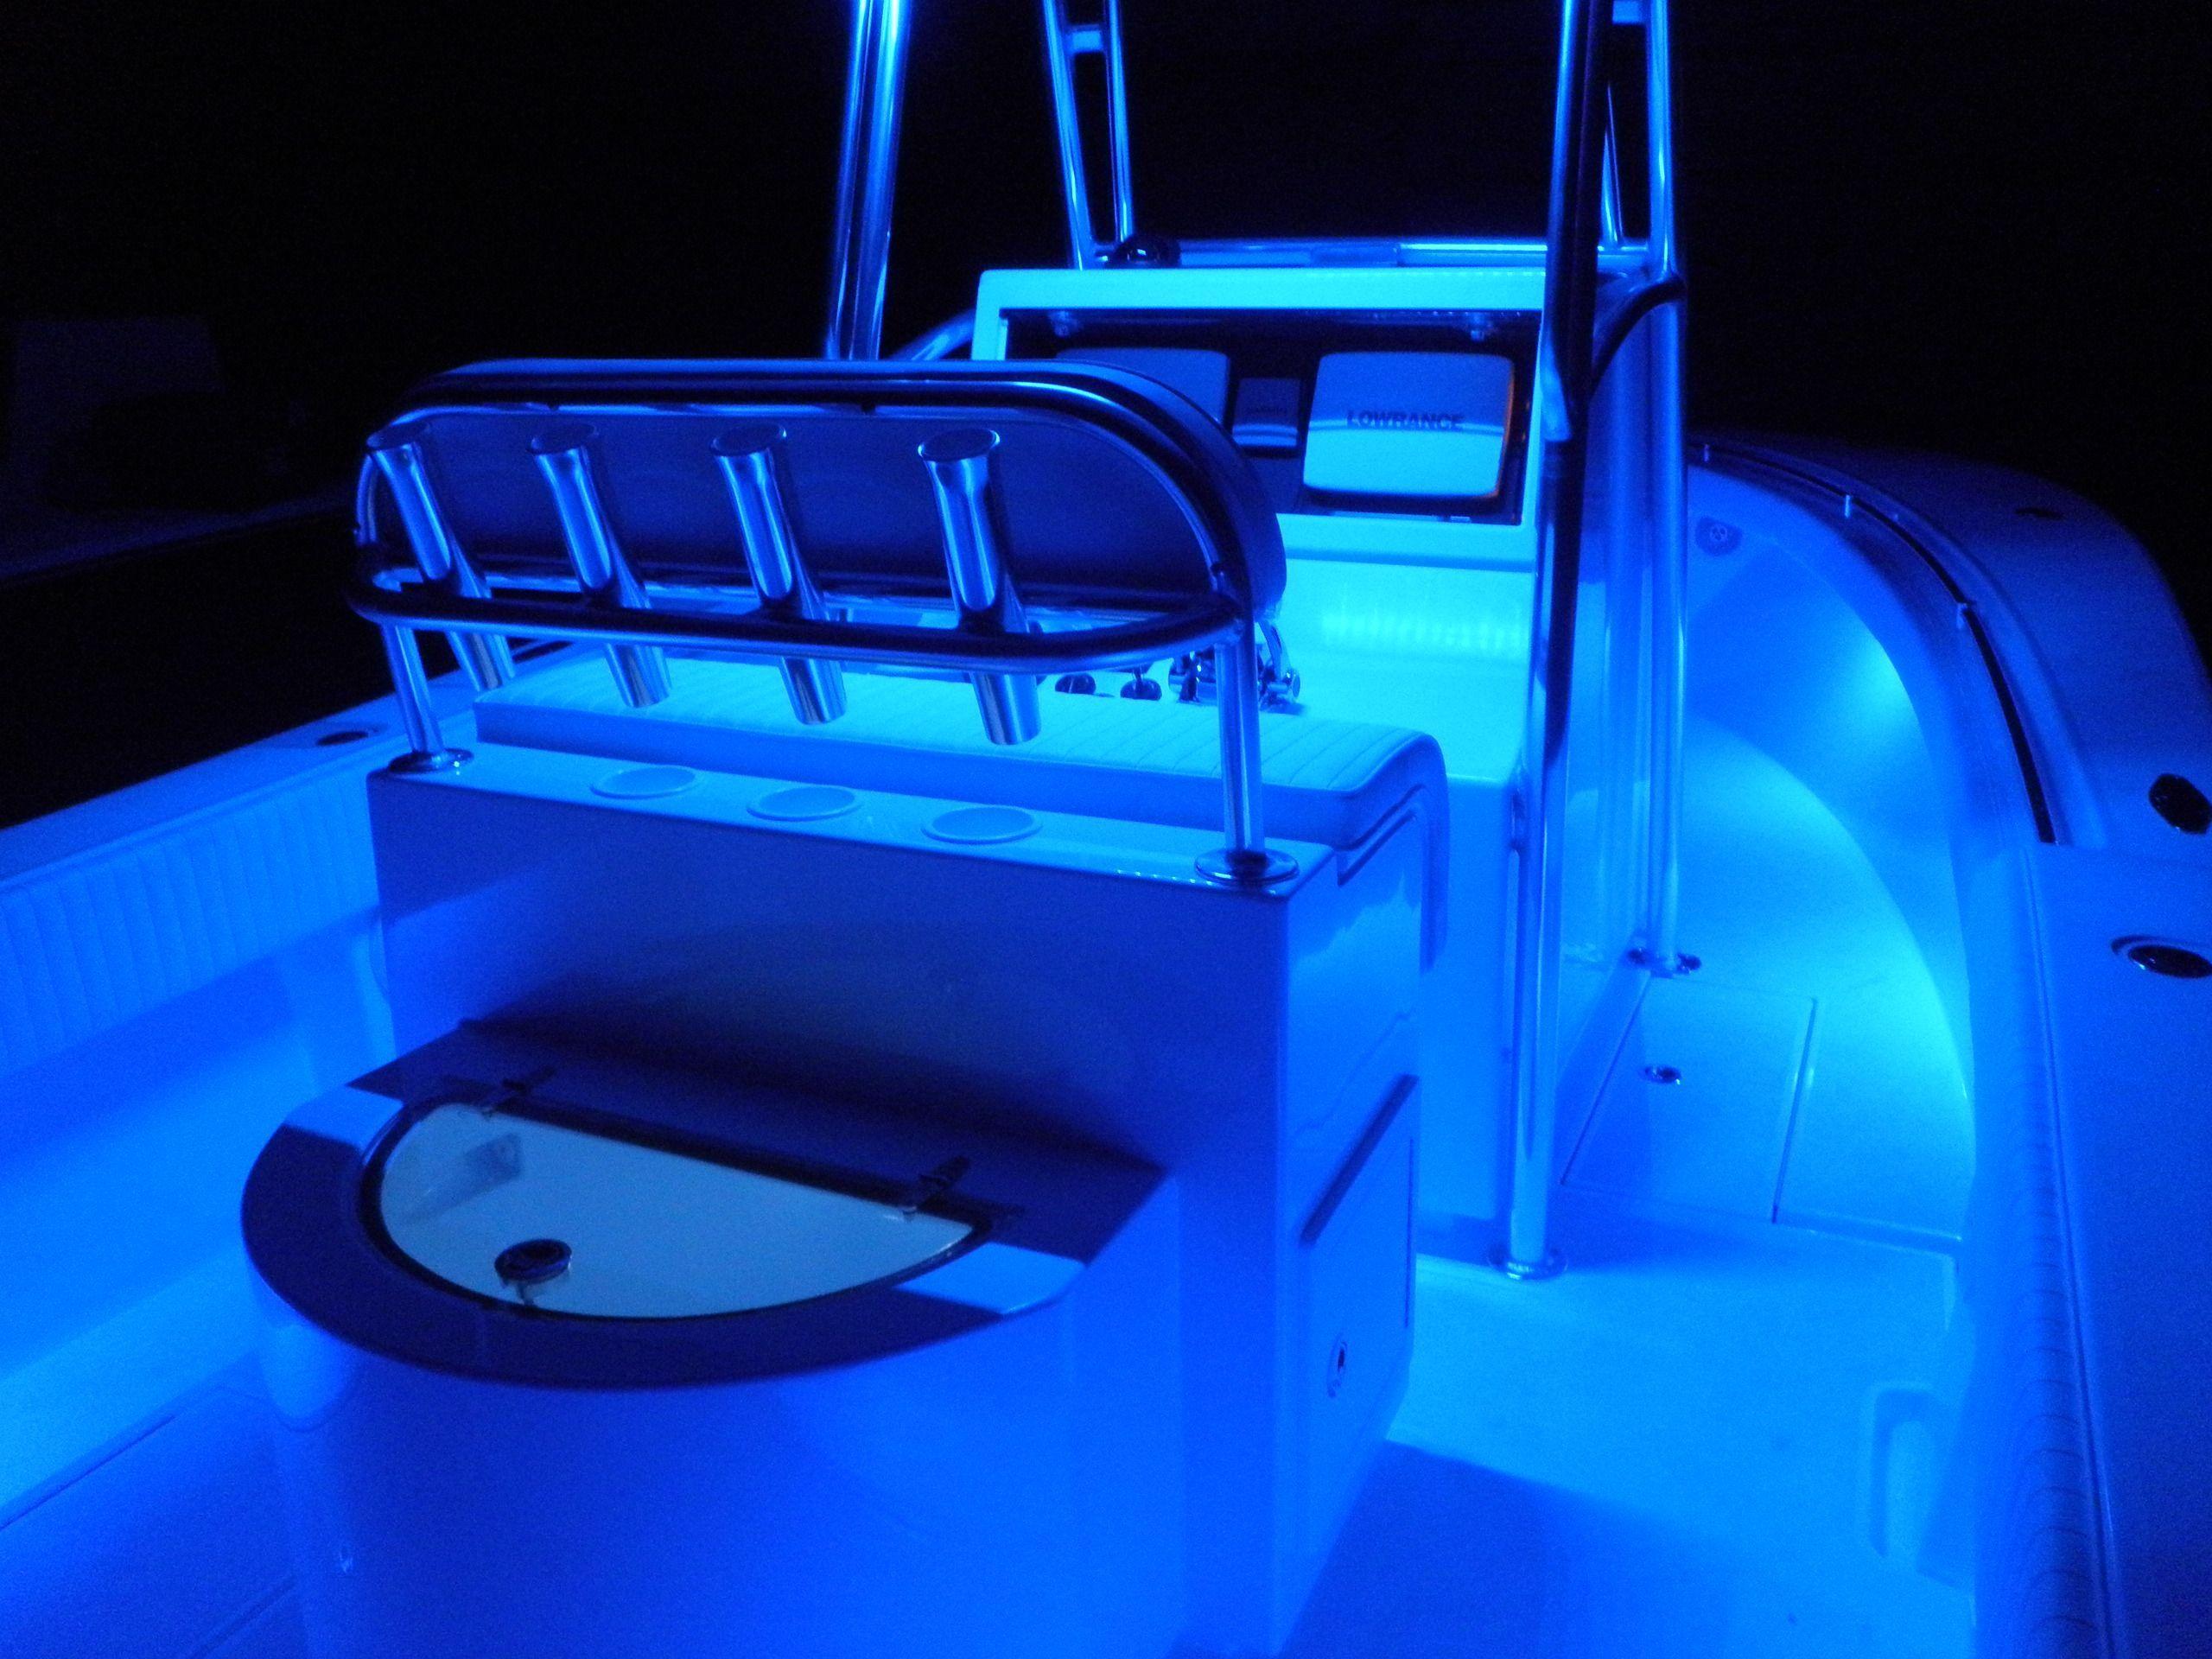 Led Boat Deck Lights Led Boat Lights Boat Lights Center Console Boats